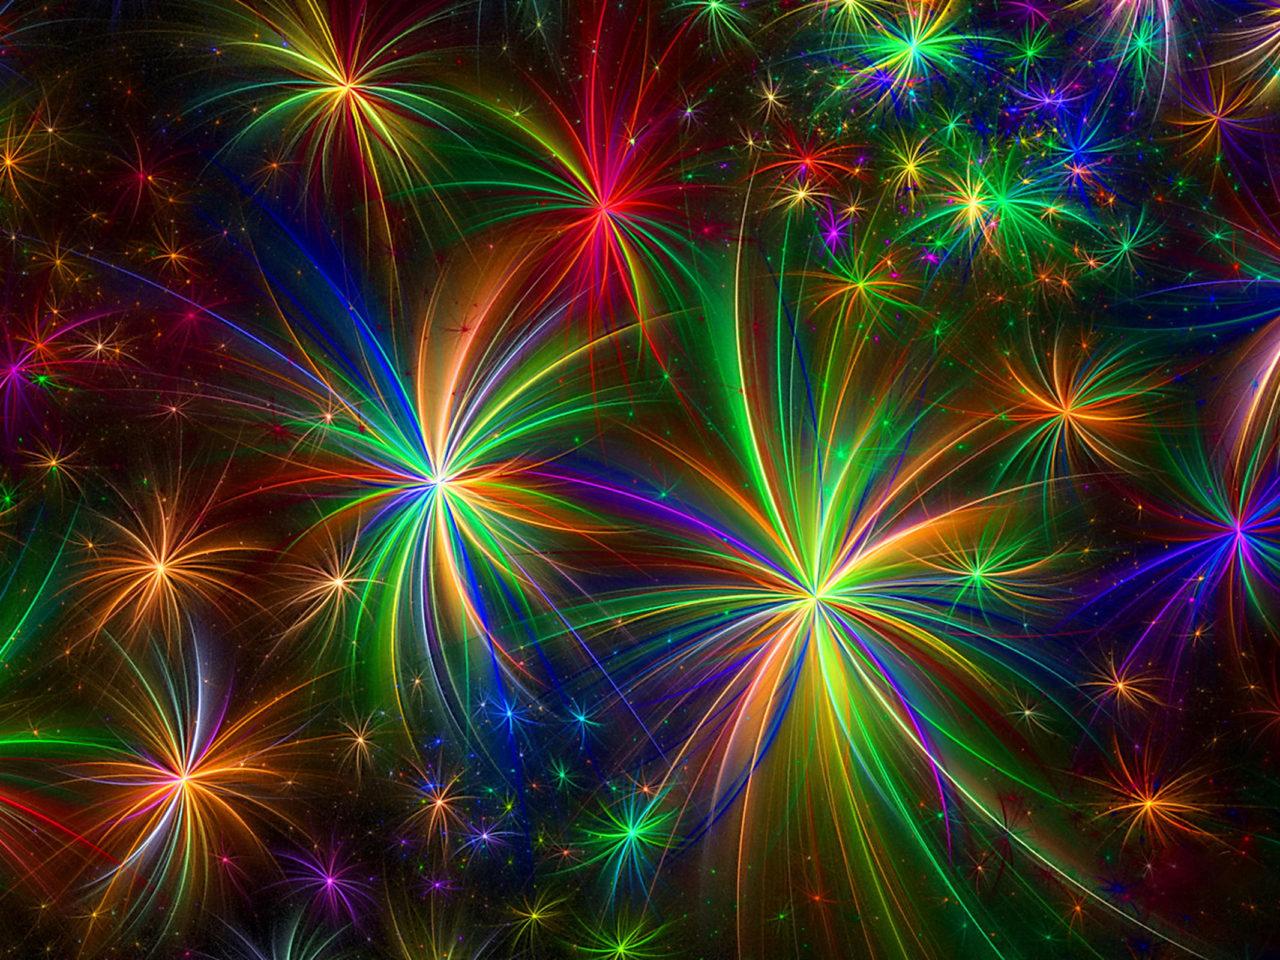 Lock Screen Wallpaper Hd Colorful Firework Celebration Graphics Hd Wallpaper